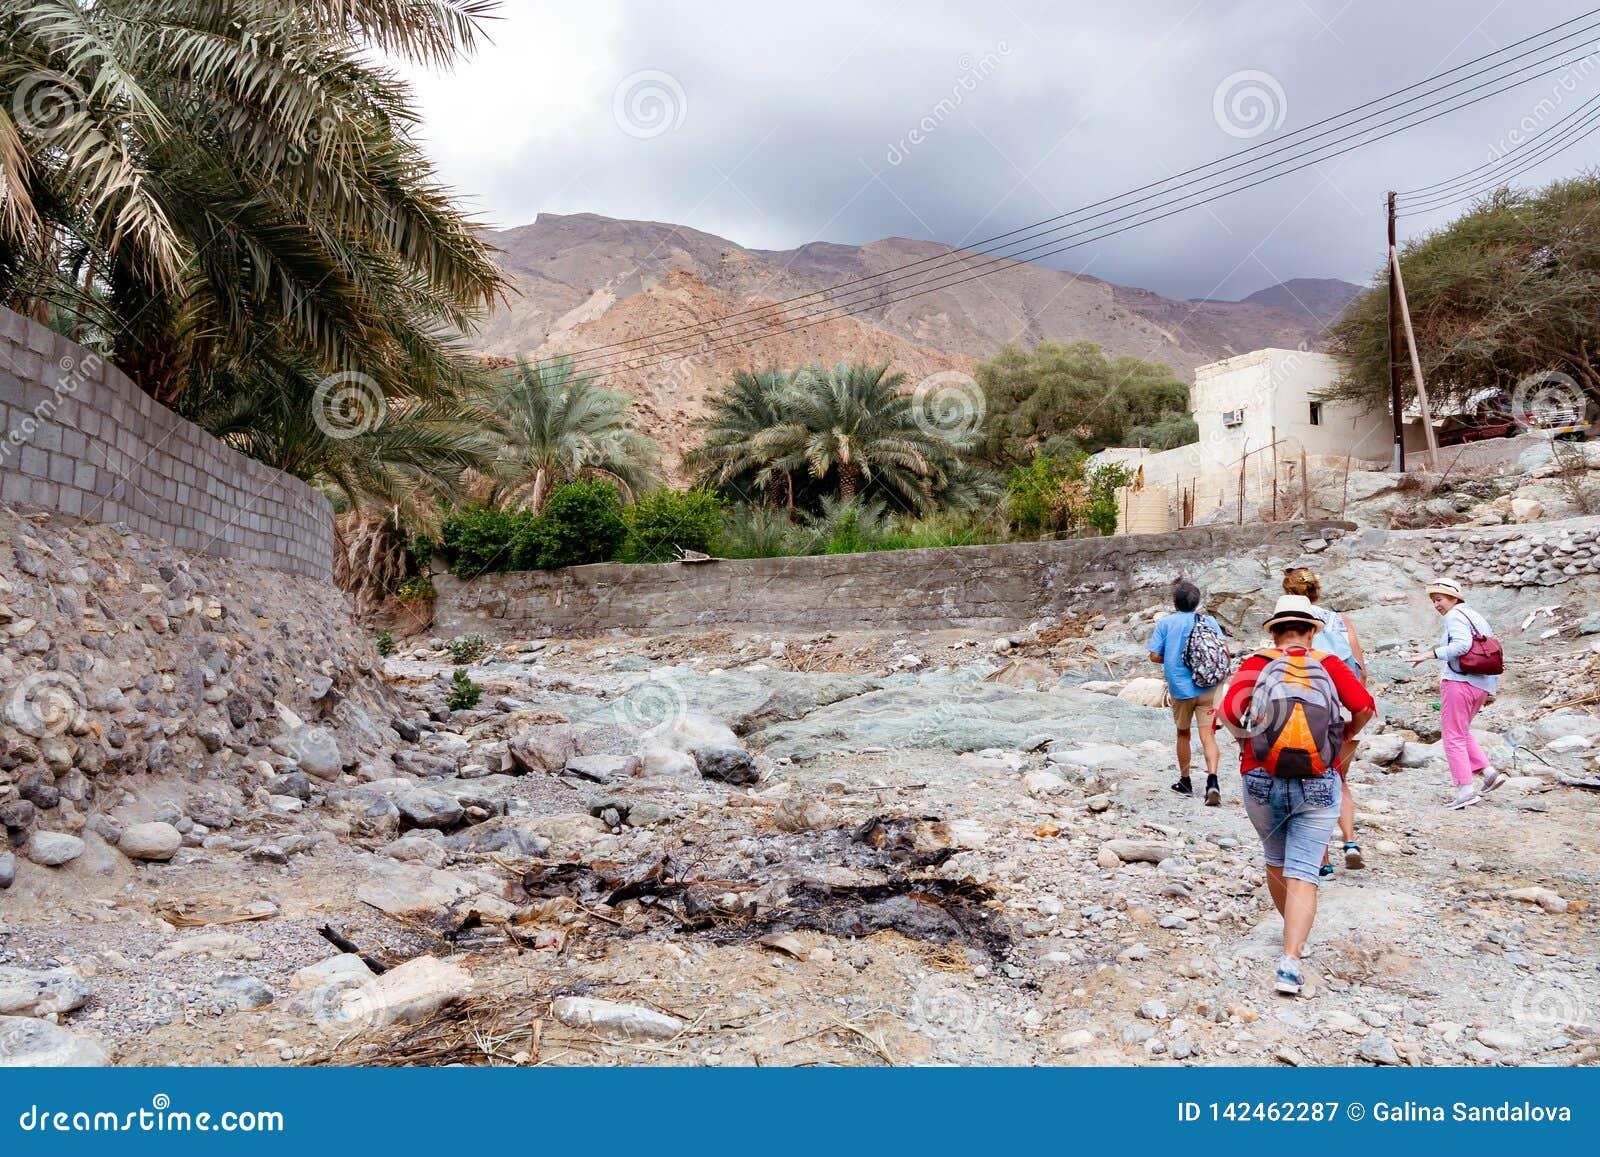 Muscat, Ομάν - 16 Δεκεμβρίου 2018: η ομάδα τουριστών περπατά κατά μήκος του wadi - μια στεγνωμένη κοίτη ποταμού - στα περίχωρα Mu